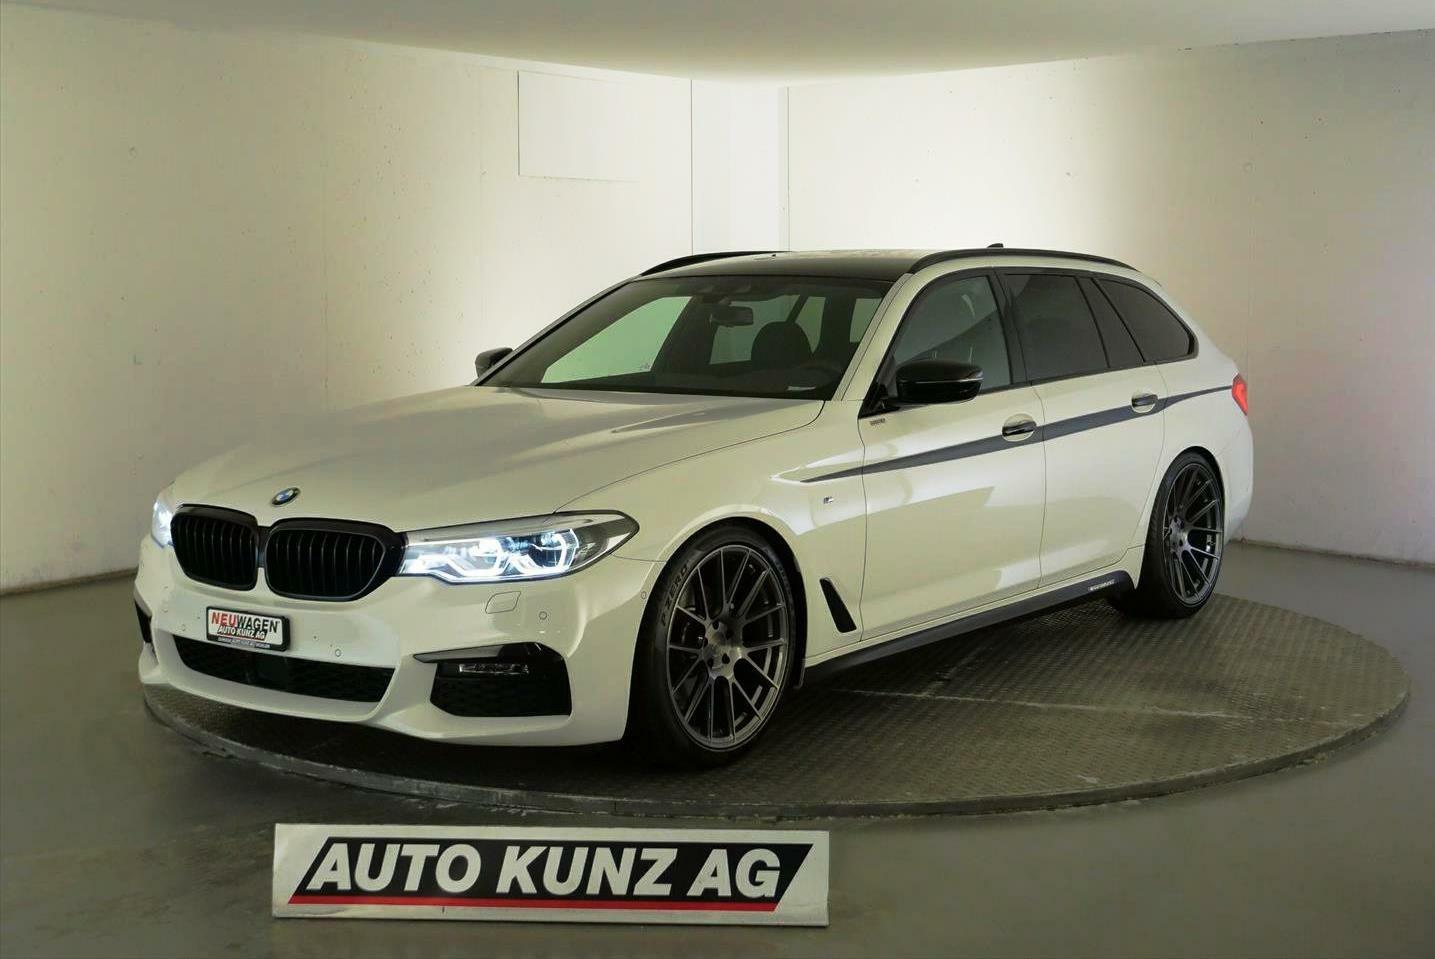 estate BMW 5er 520 d xDrive Touring M Sportpaket Spezial 2020er Au